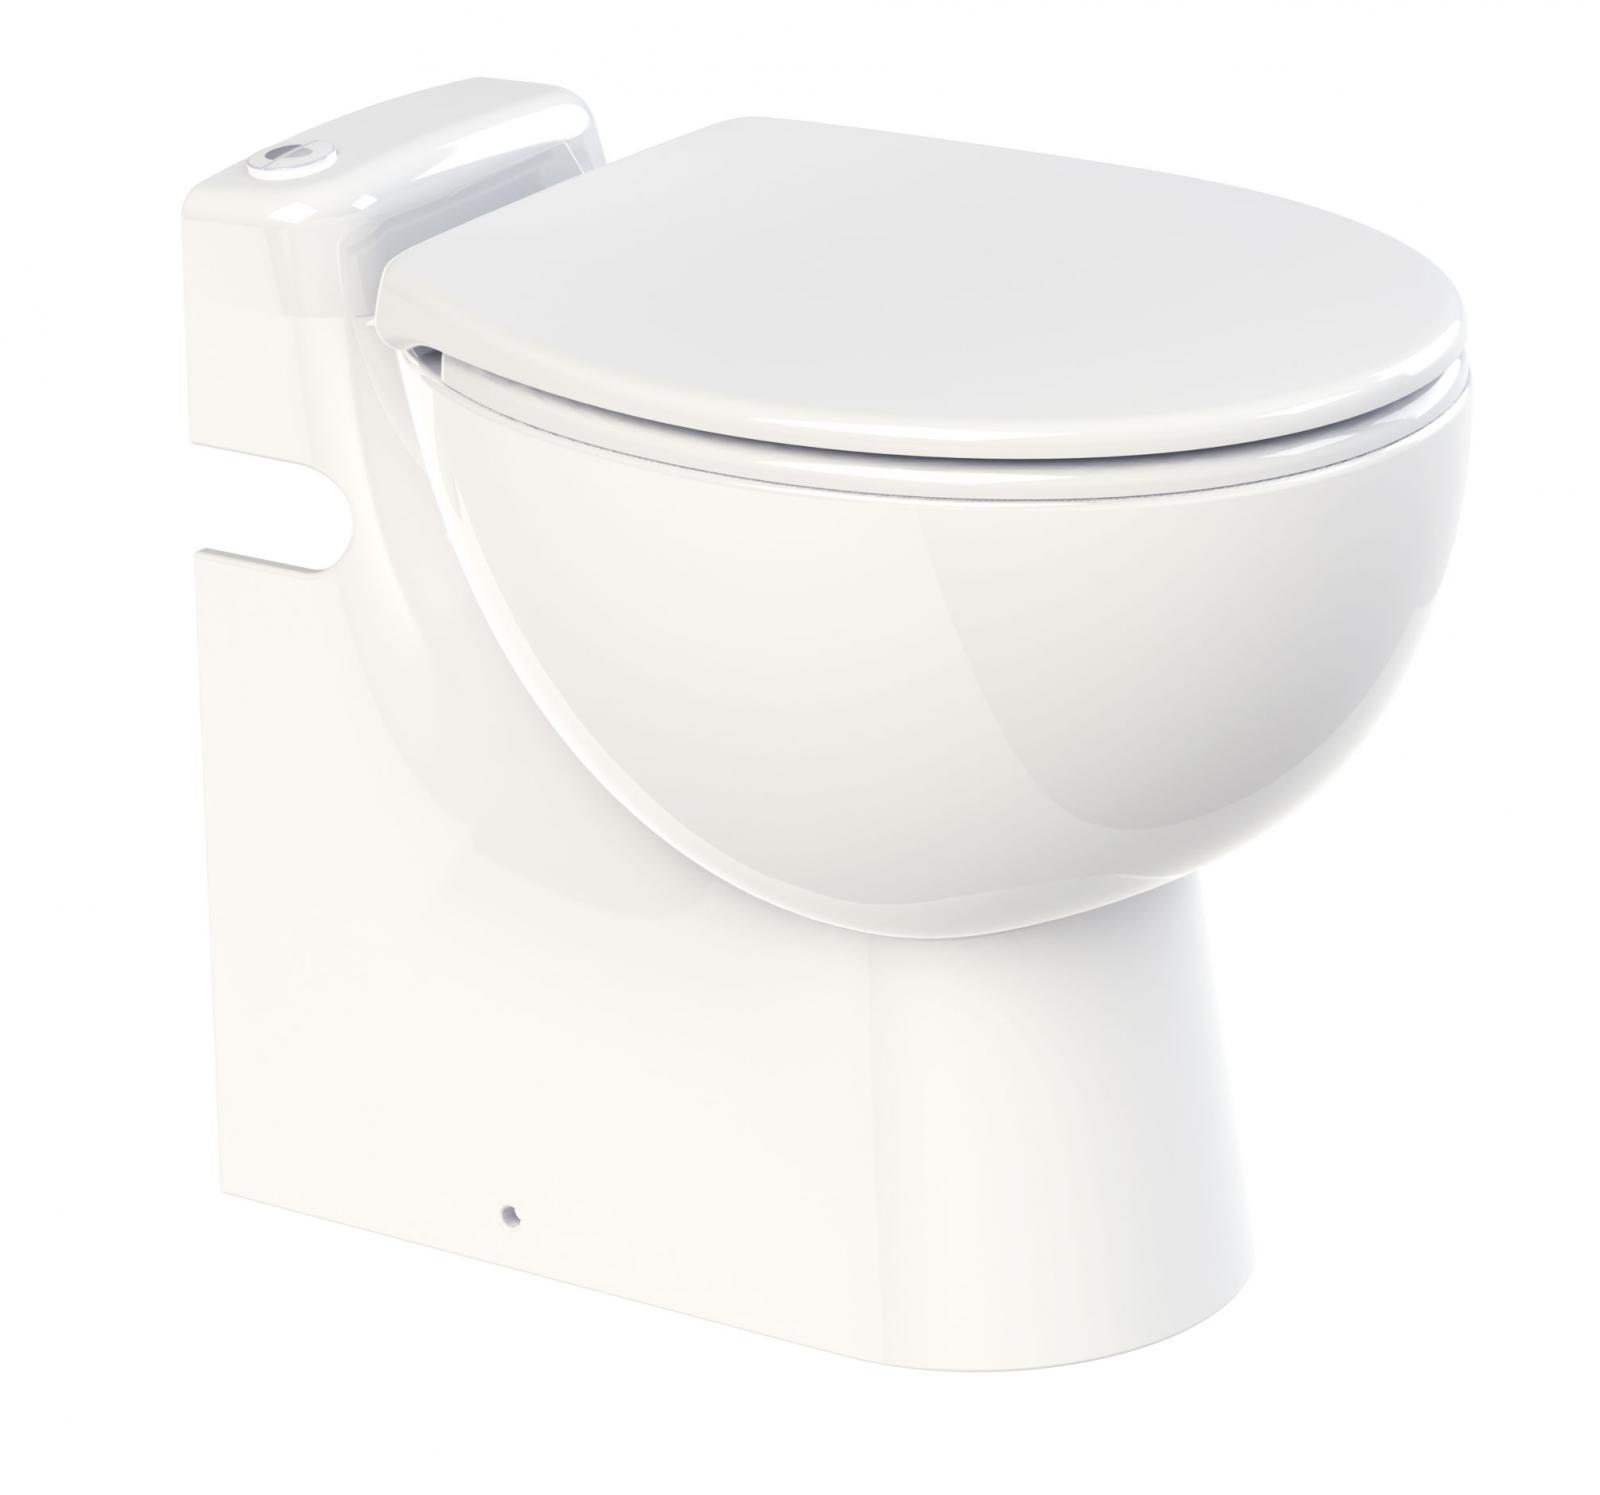 sfa sanicompact pro stand wc incl wc sitz mit integrierter hebeanlage mit wt anschluss 0011. Black Bedroom Furniture Sets. Home Design Ideas